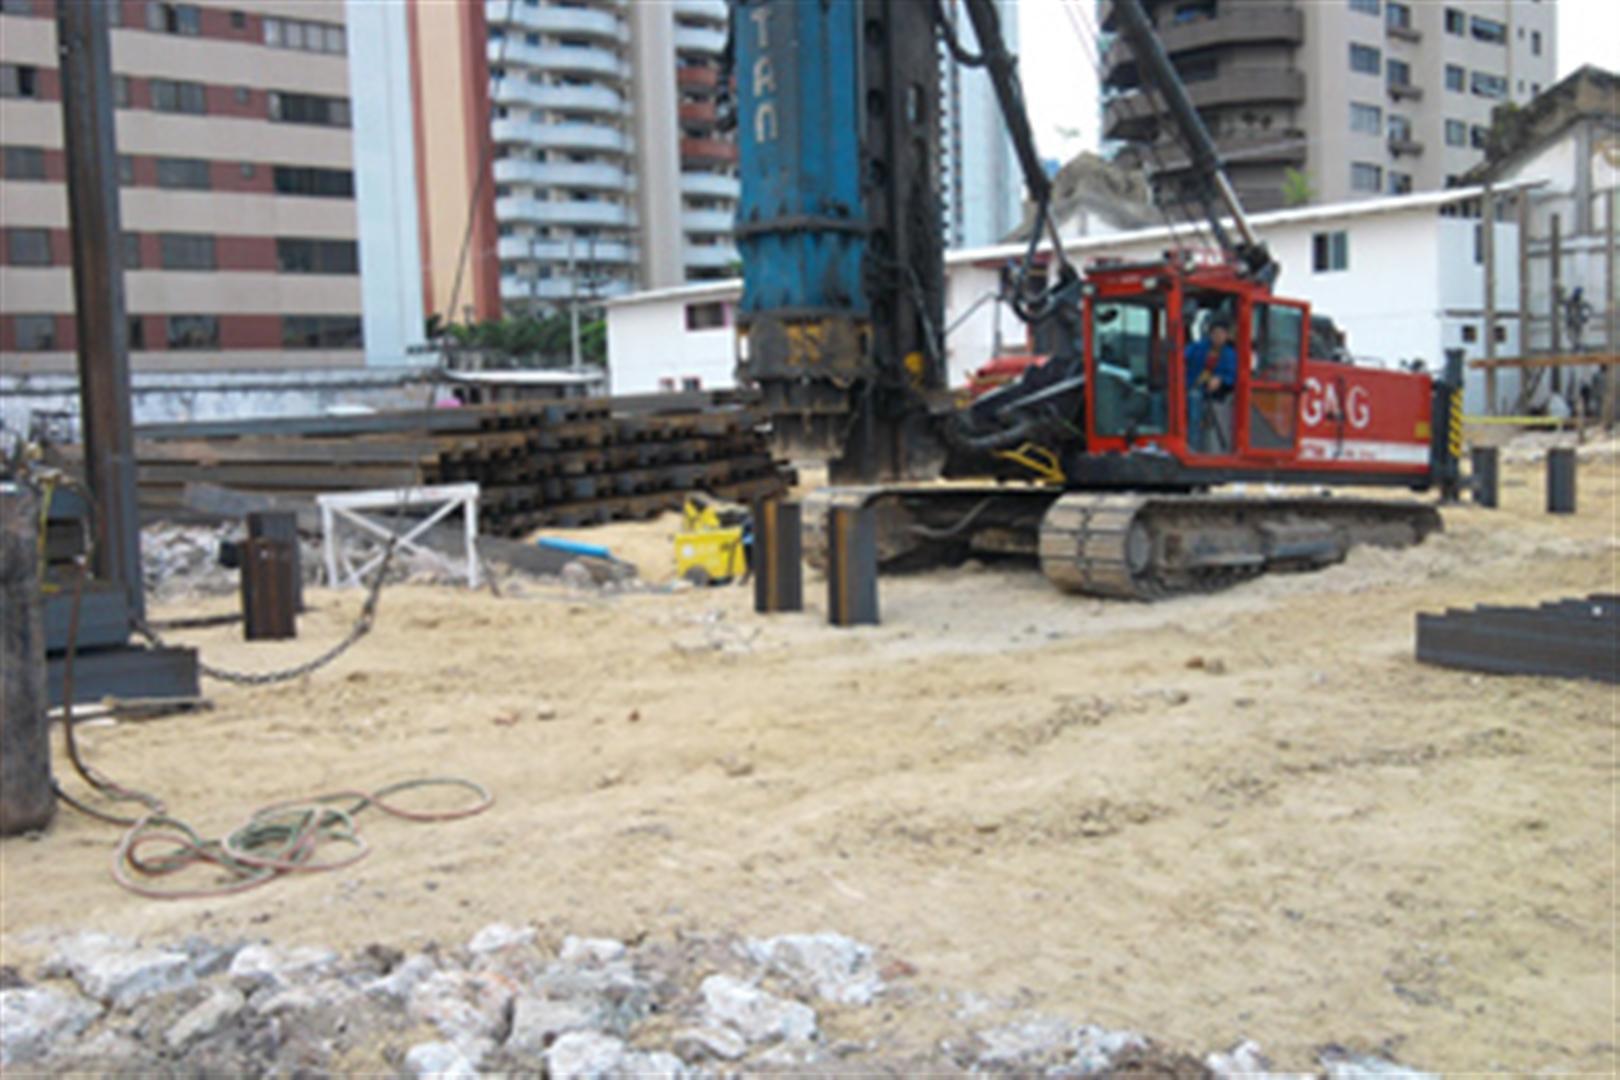 Fundação   Mandarim Belém – Apartamentoem  Umarizal  - Belém - Pará